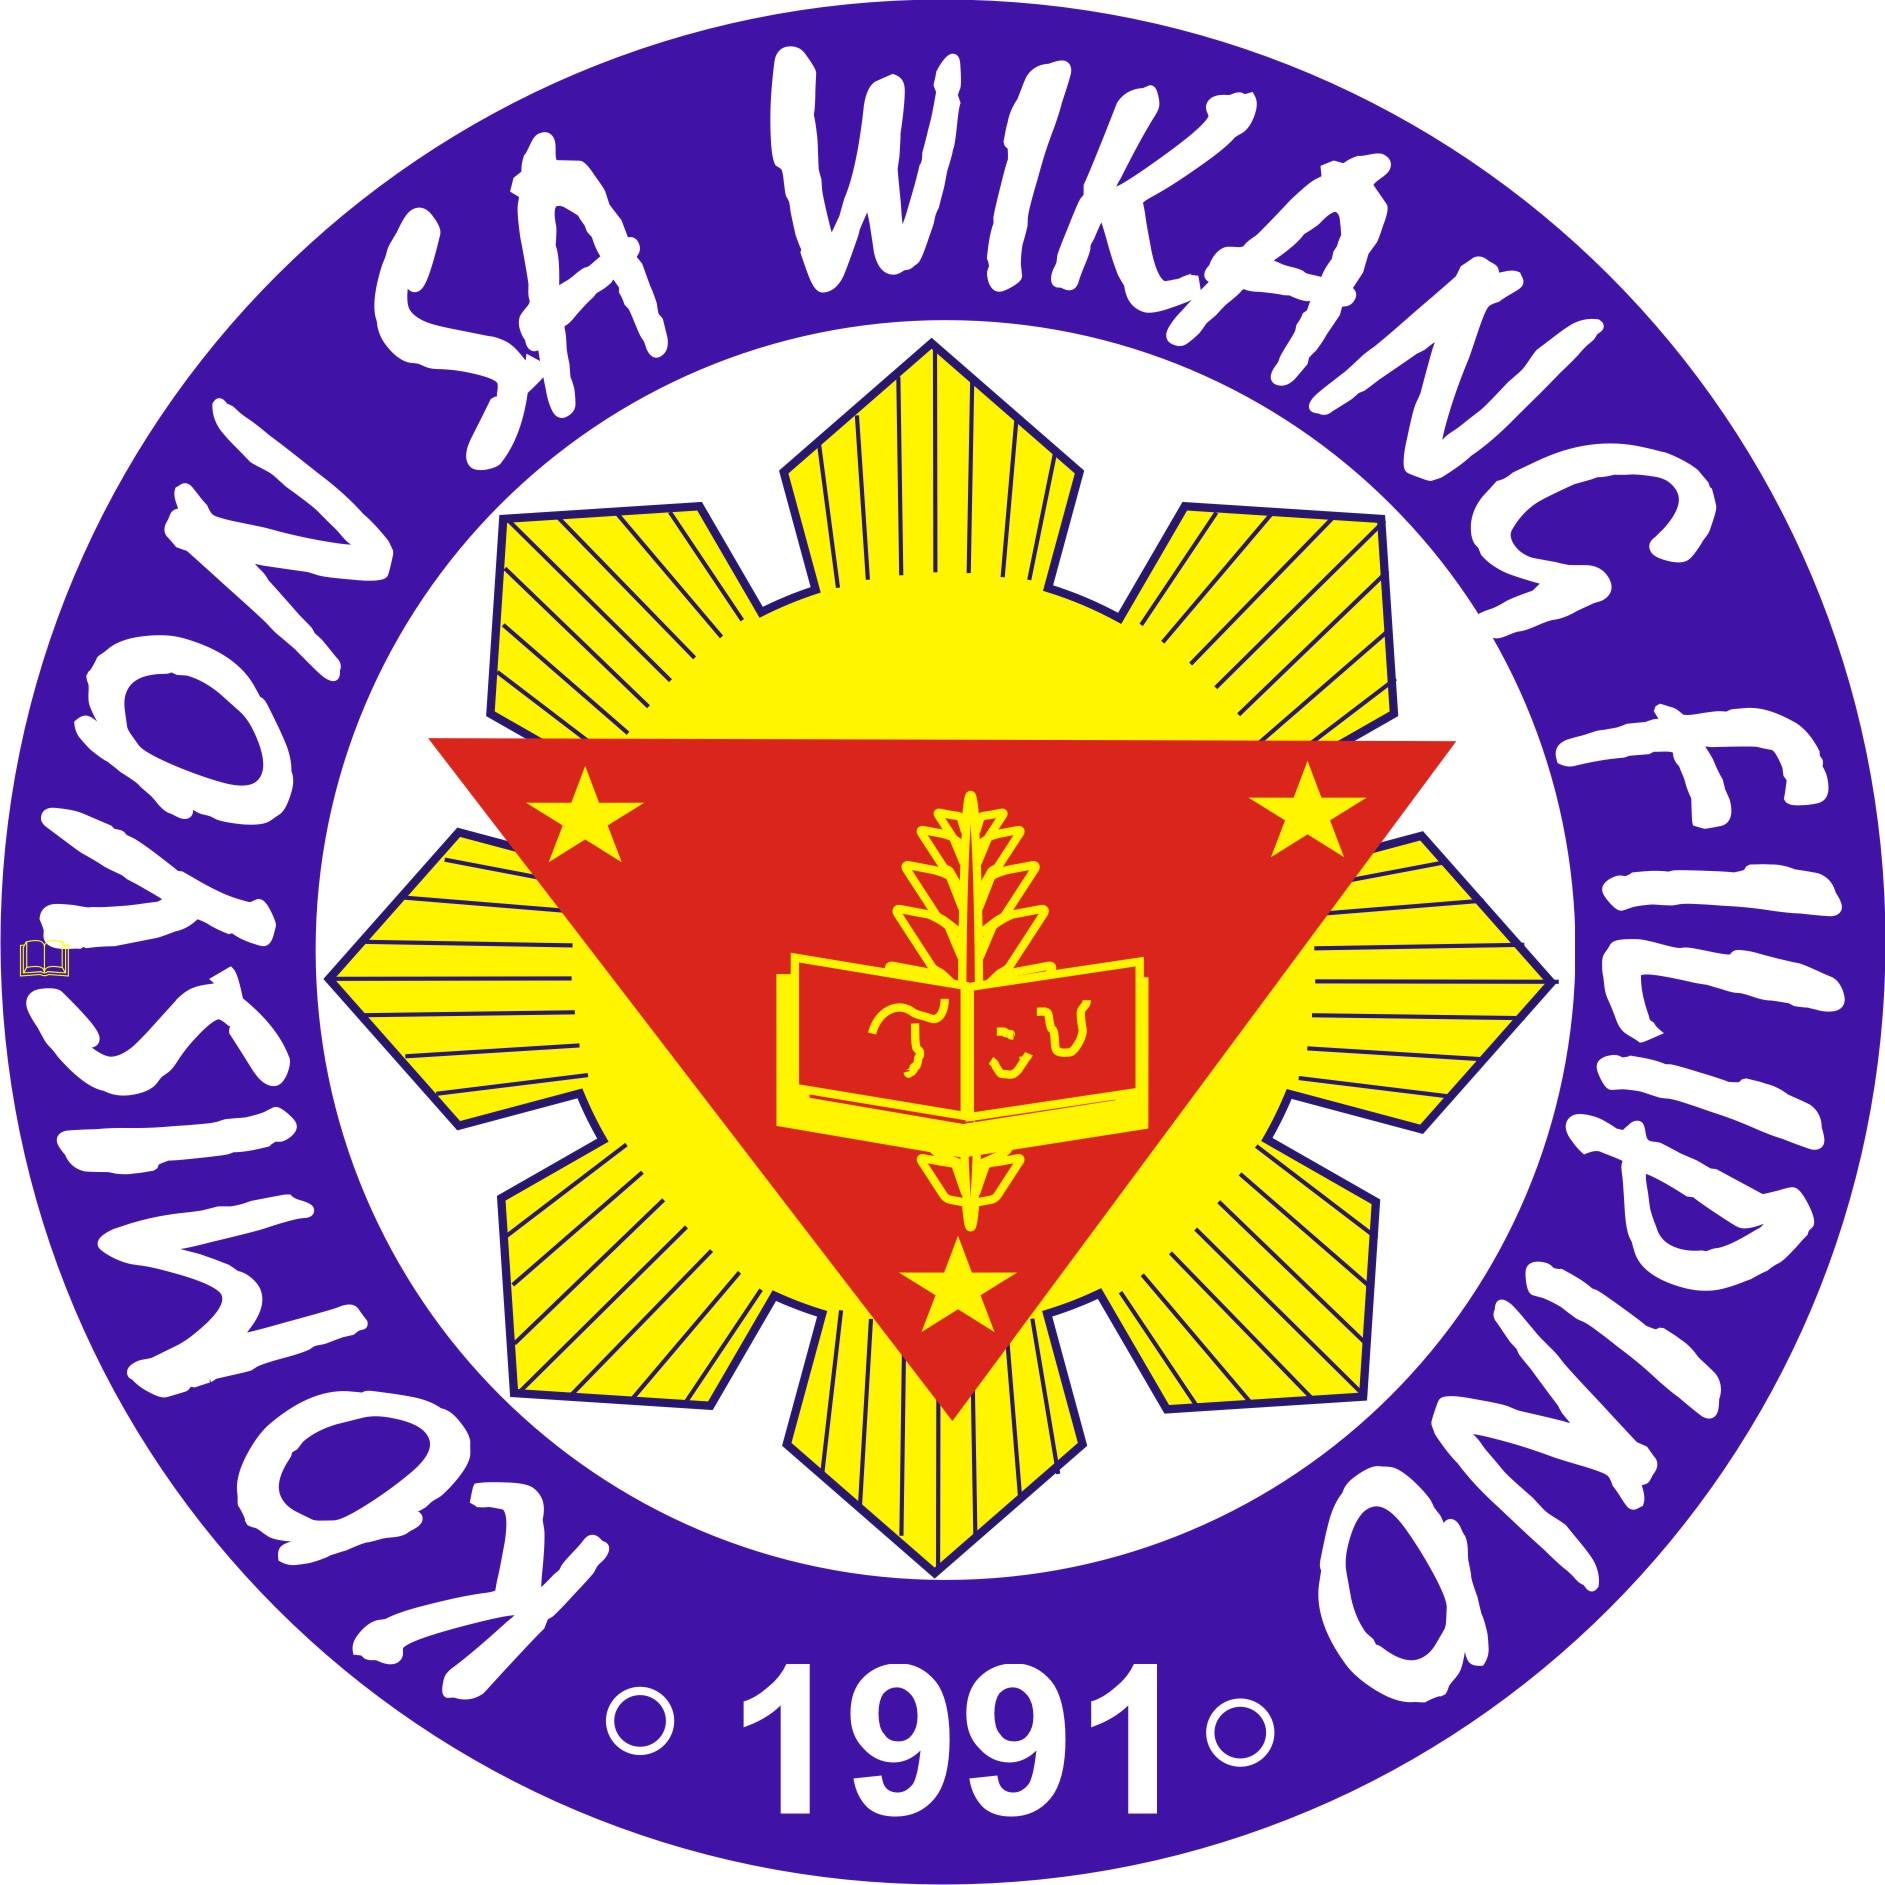 Wika / Maraming Wika, Matatag na Bansa - Chairman Nolasco